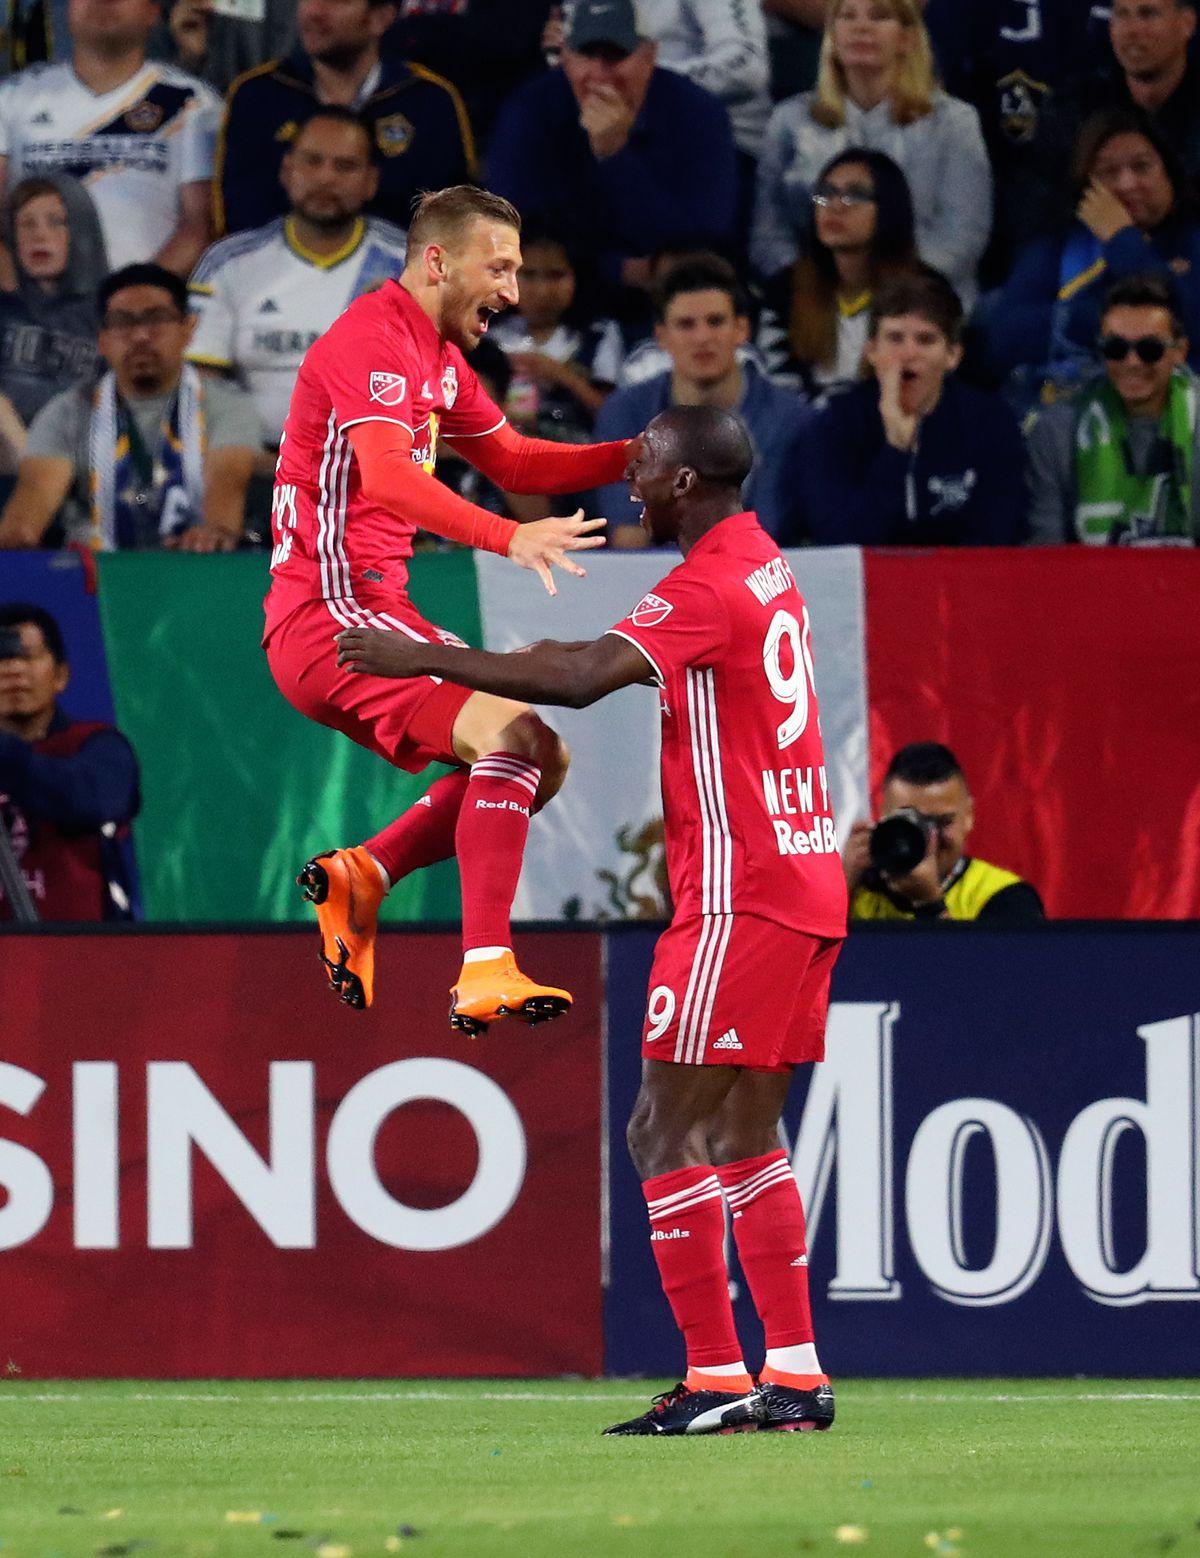 MLS: New York Red Bulls at Los Angeles Galaxy